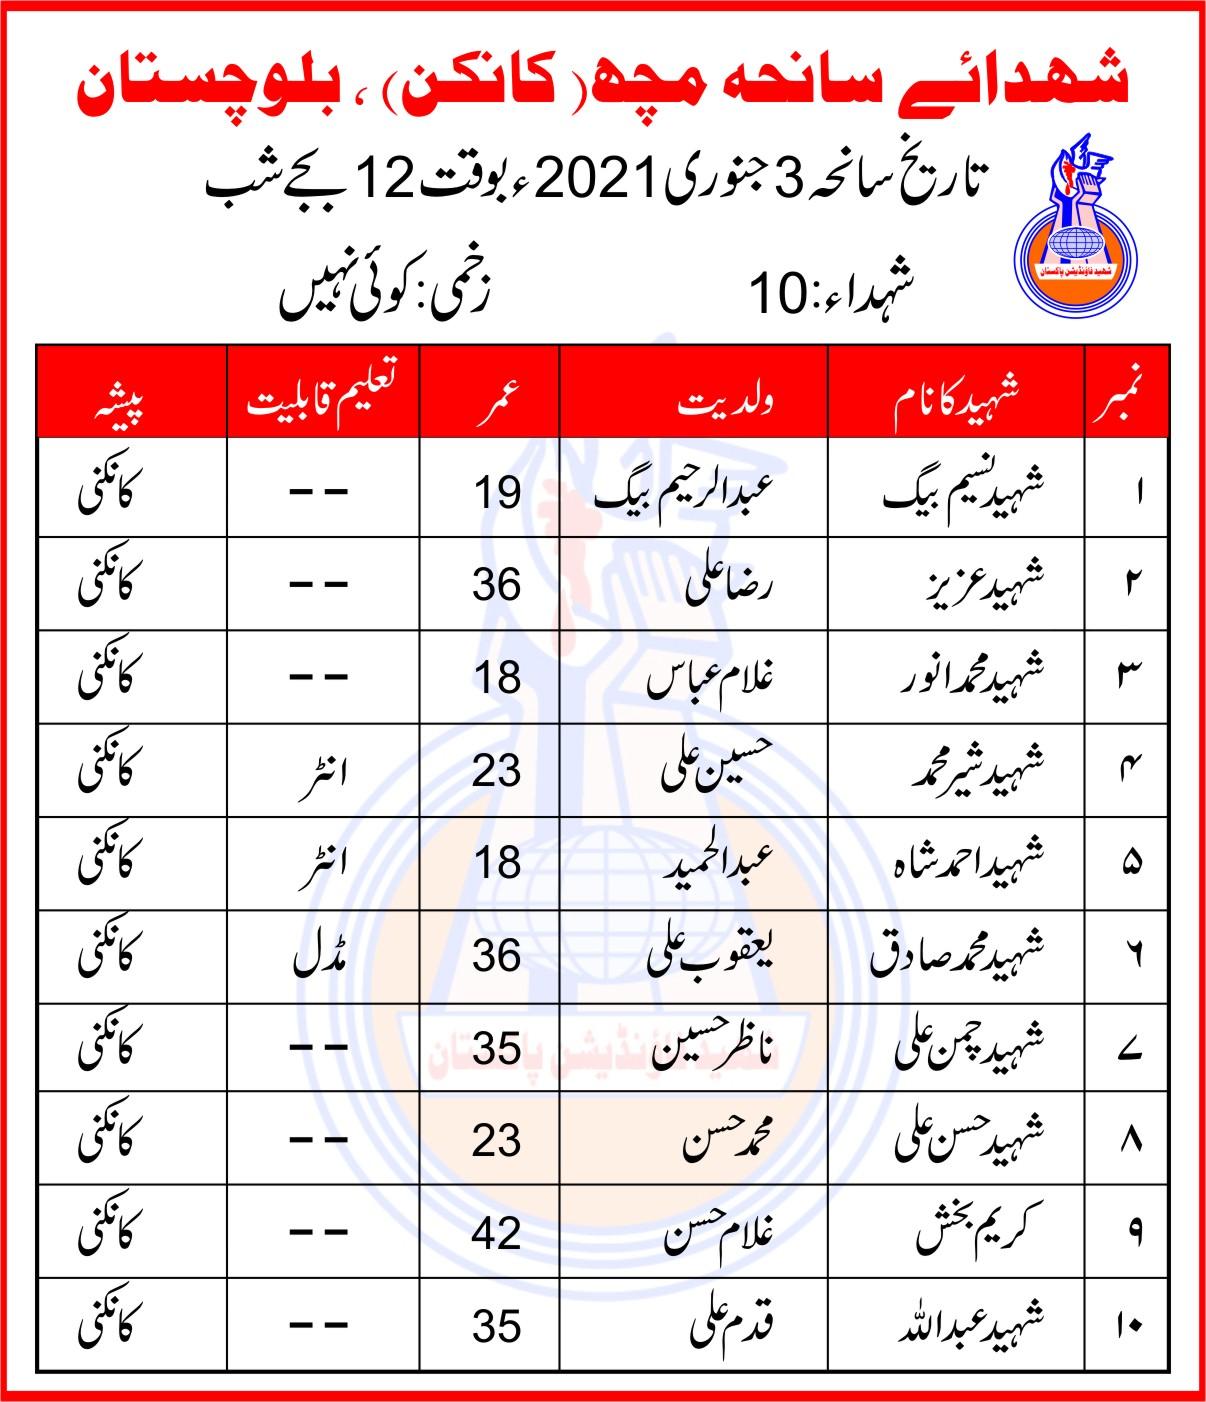 Quetta Shaheed Foundation Pakistan Delegates Visit Khanwada-e-Shohada-e-Saneha-e-Mach